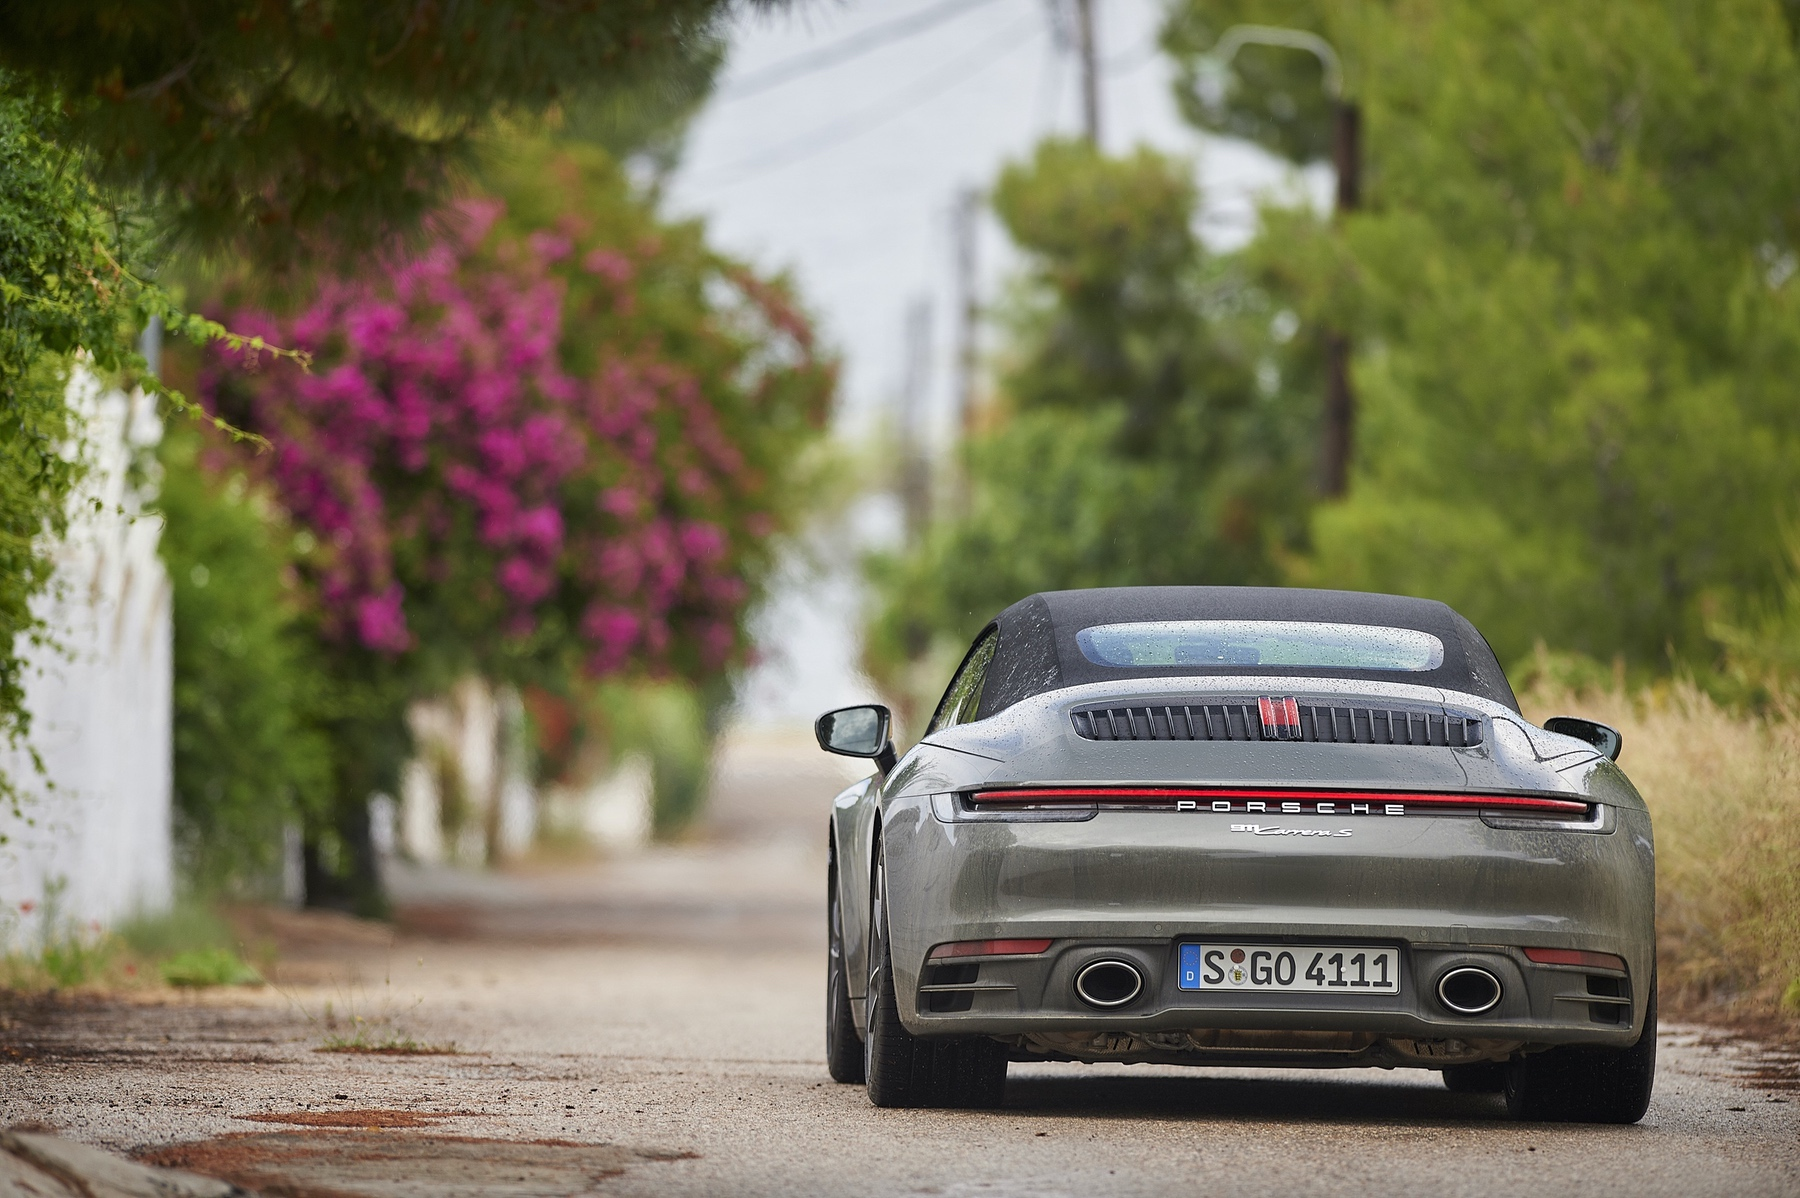 Test_Drive_Porsche_911_Athens_0105